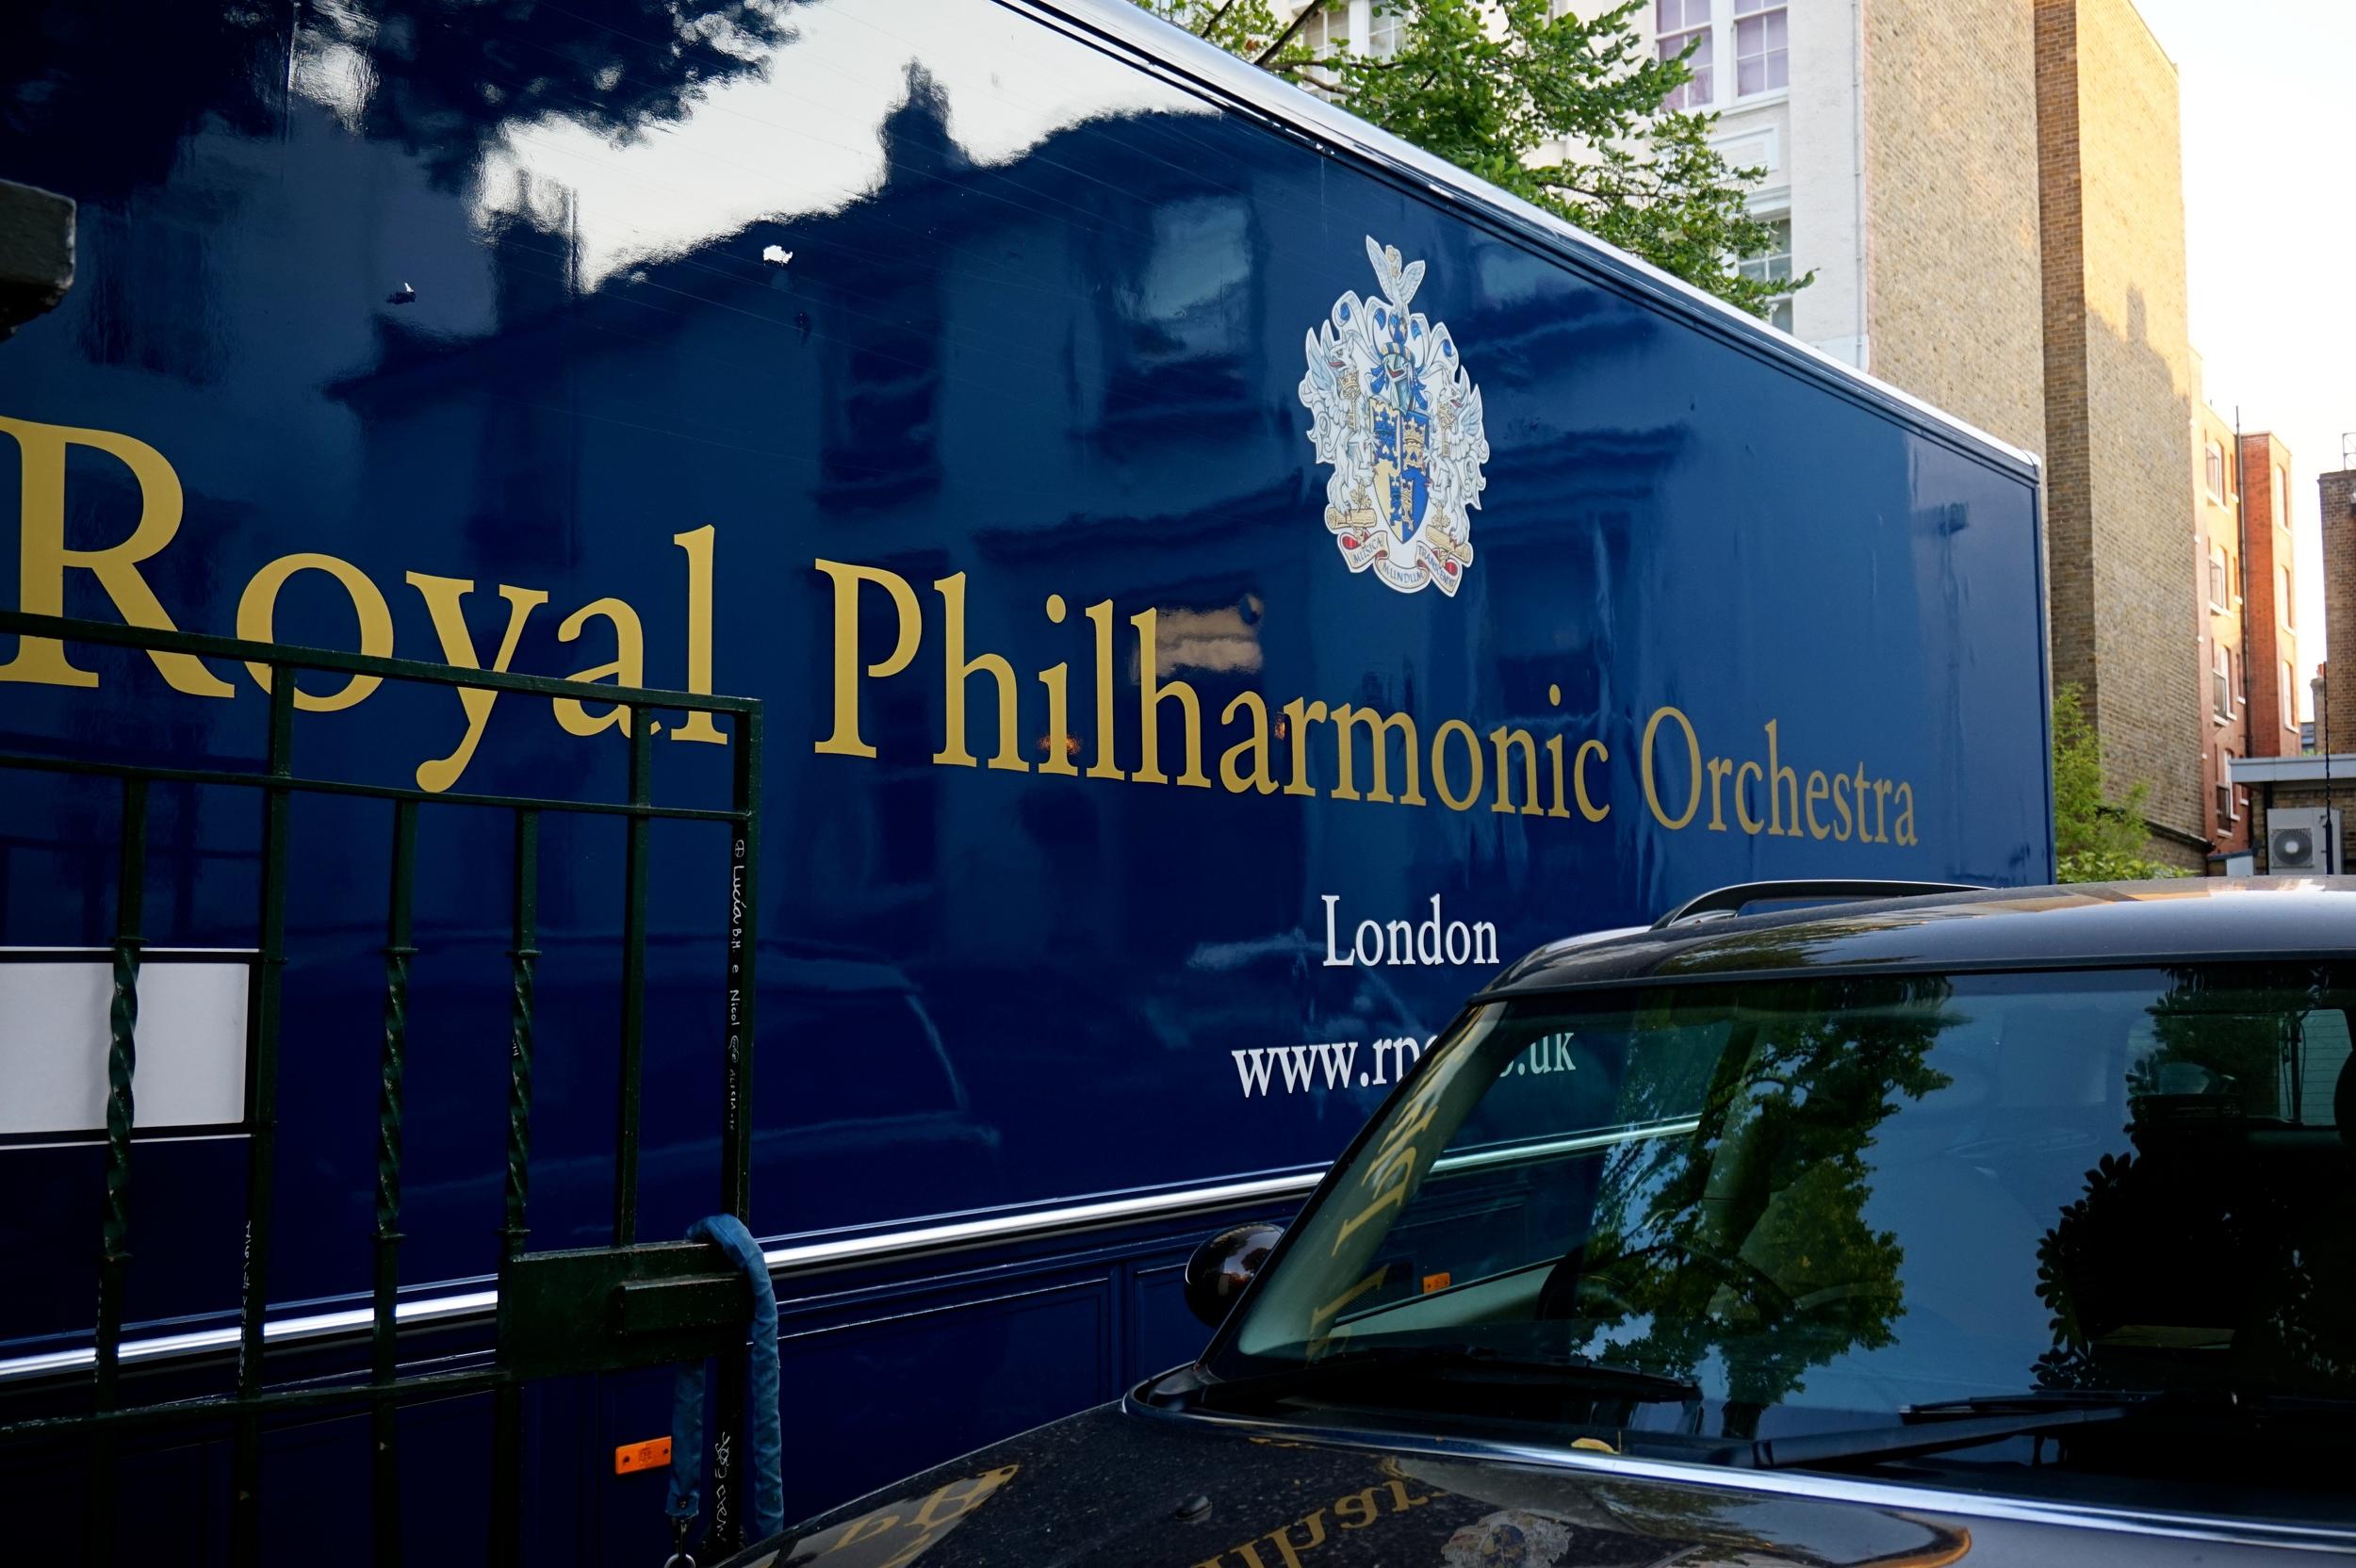 royalphillharmonicorchestraabbeyroad.jpg